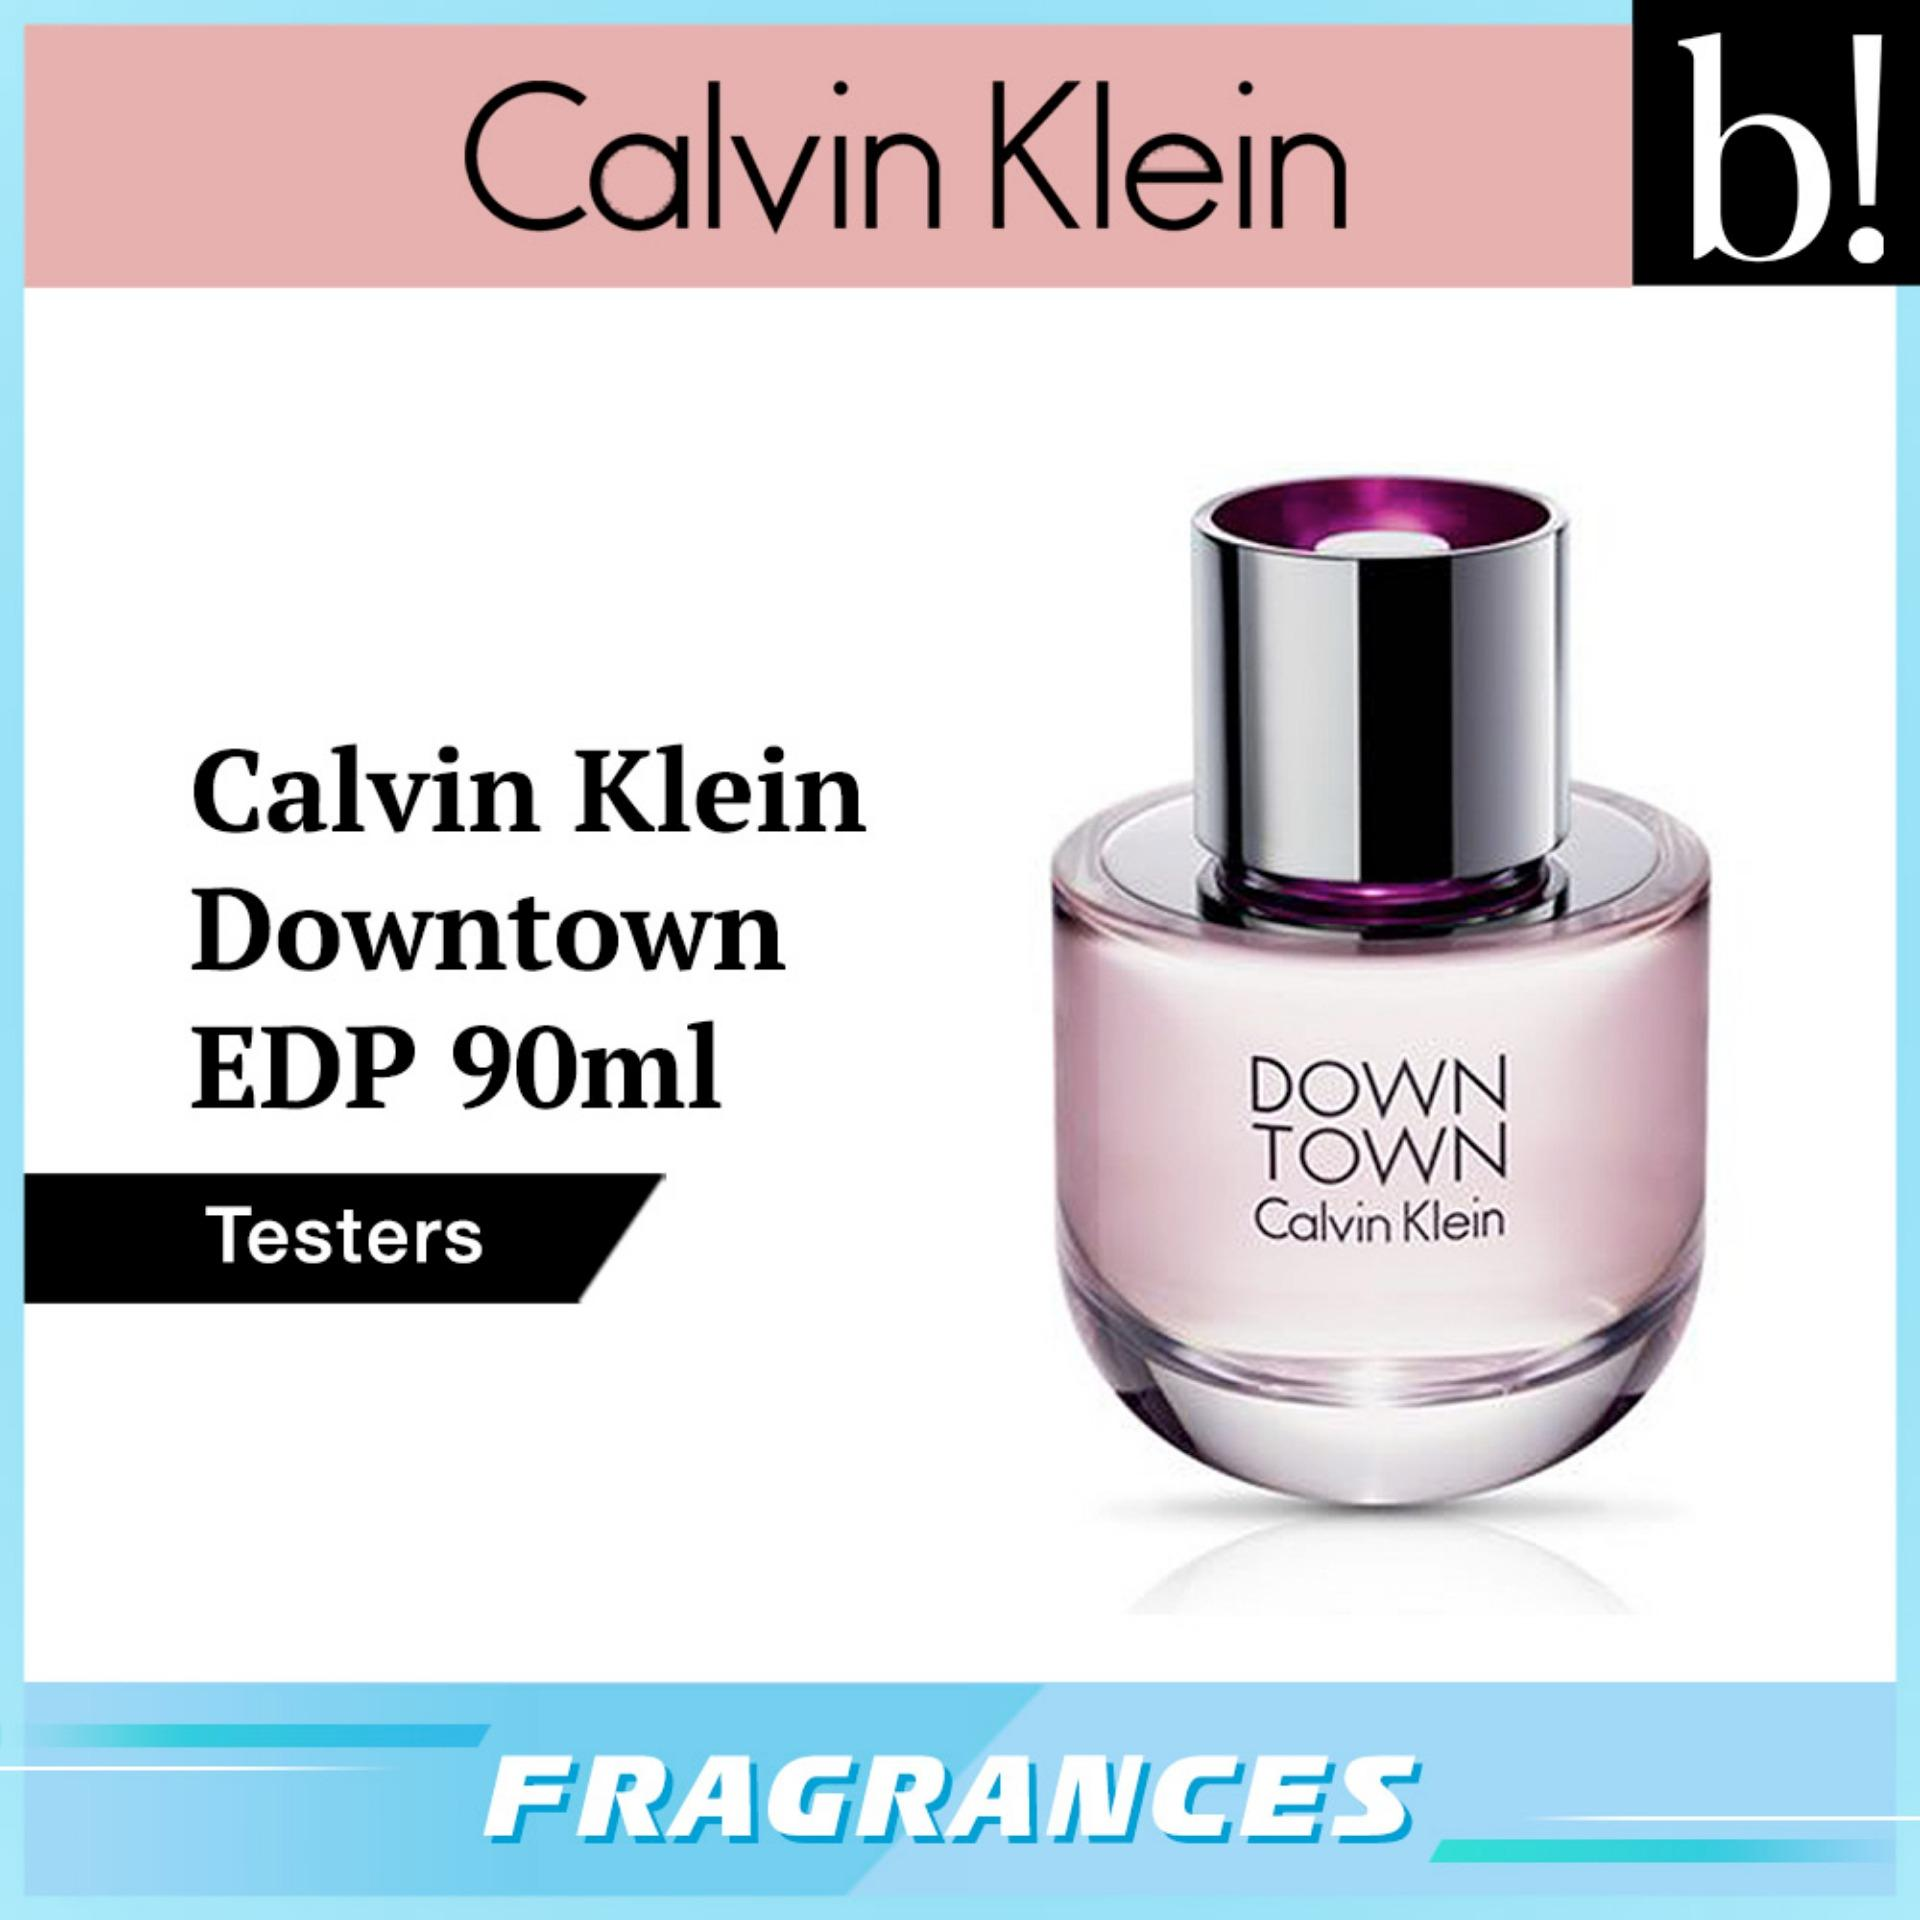 Women Klein Ladies 90ml De Beurekaluxury Parfum Edp Tester For BeautyperfumeFragrances New Eau 100Authentic Ck Downtown Calvin Brand 4j35ALR